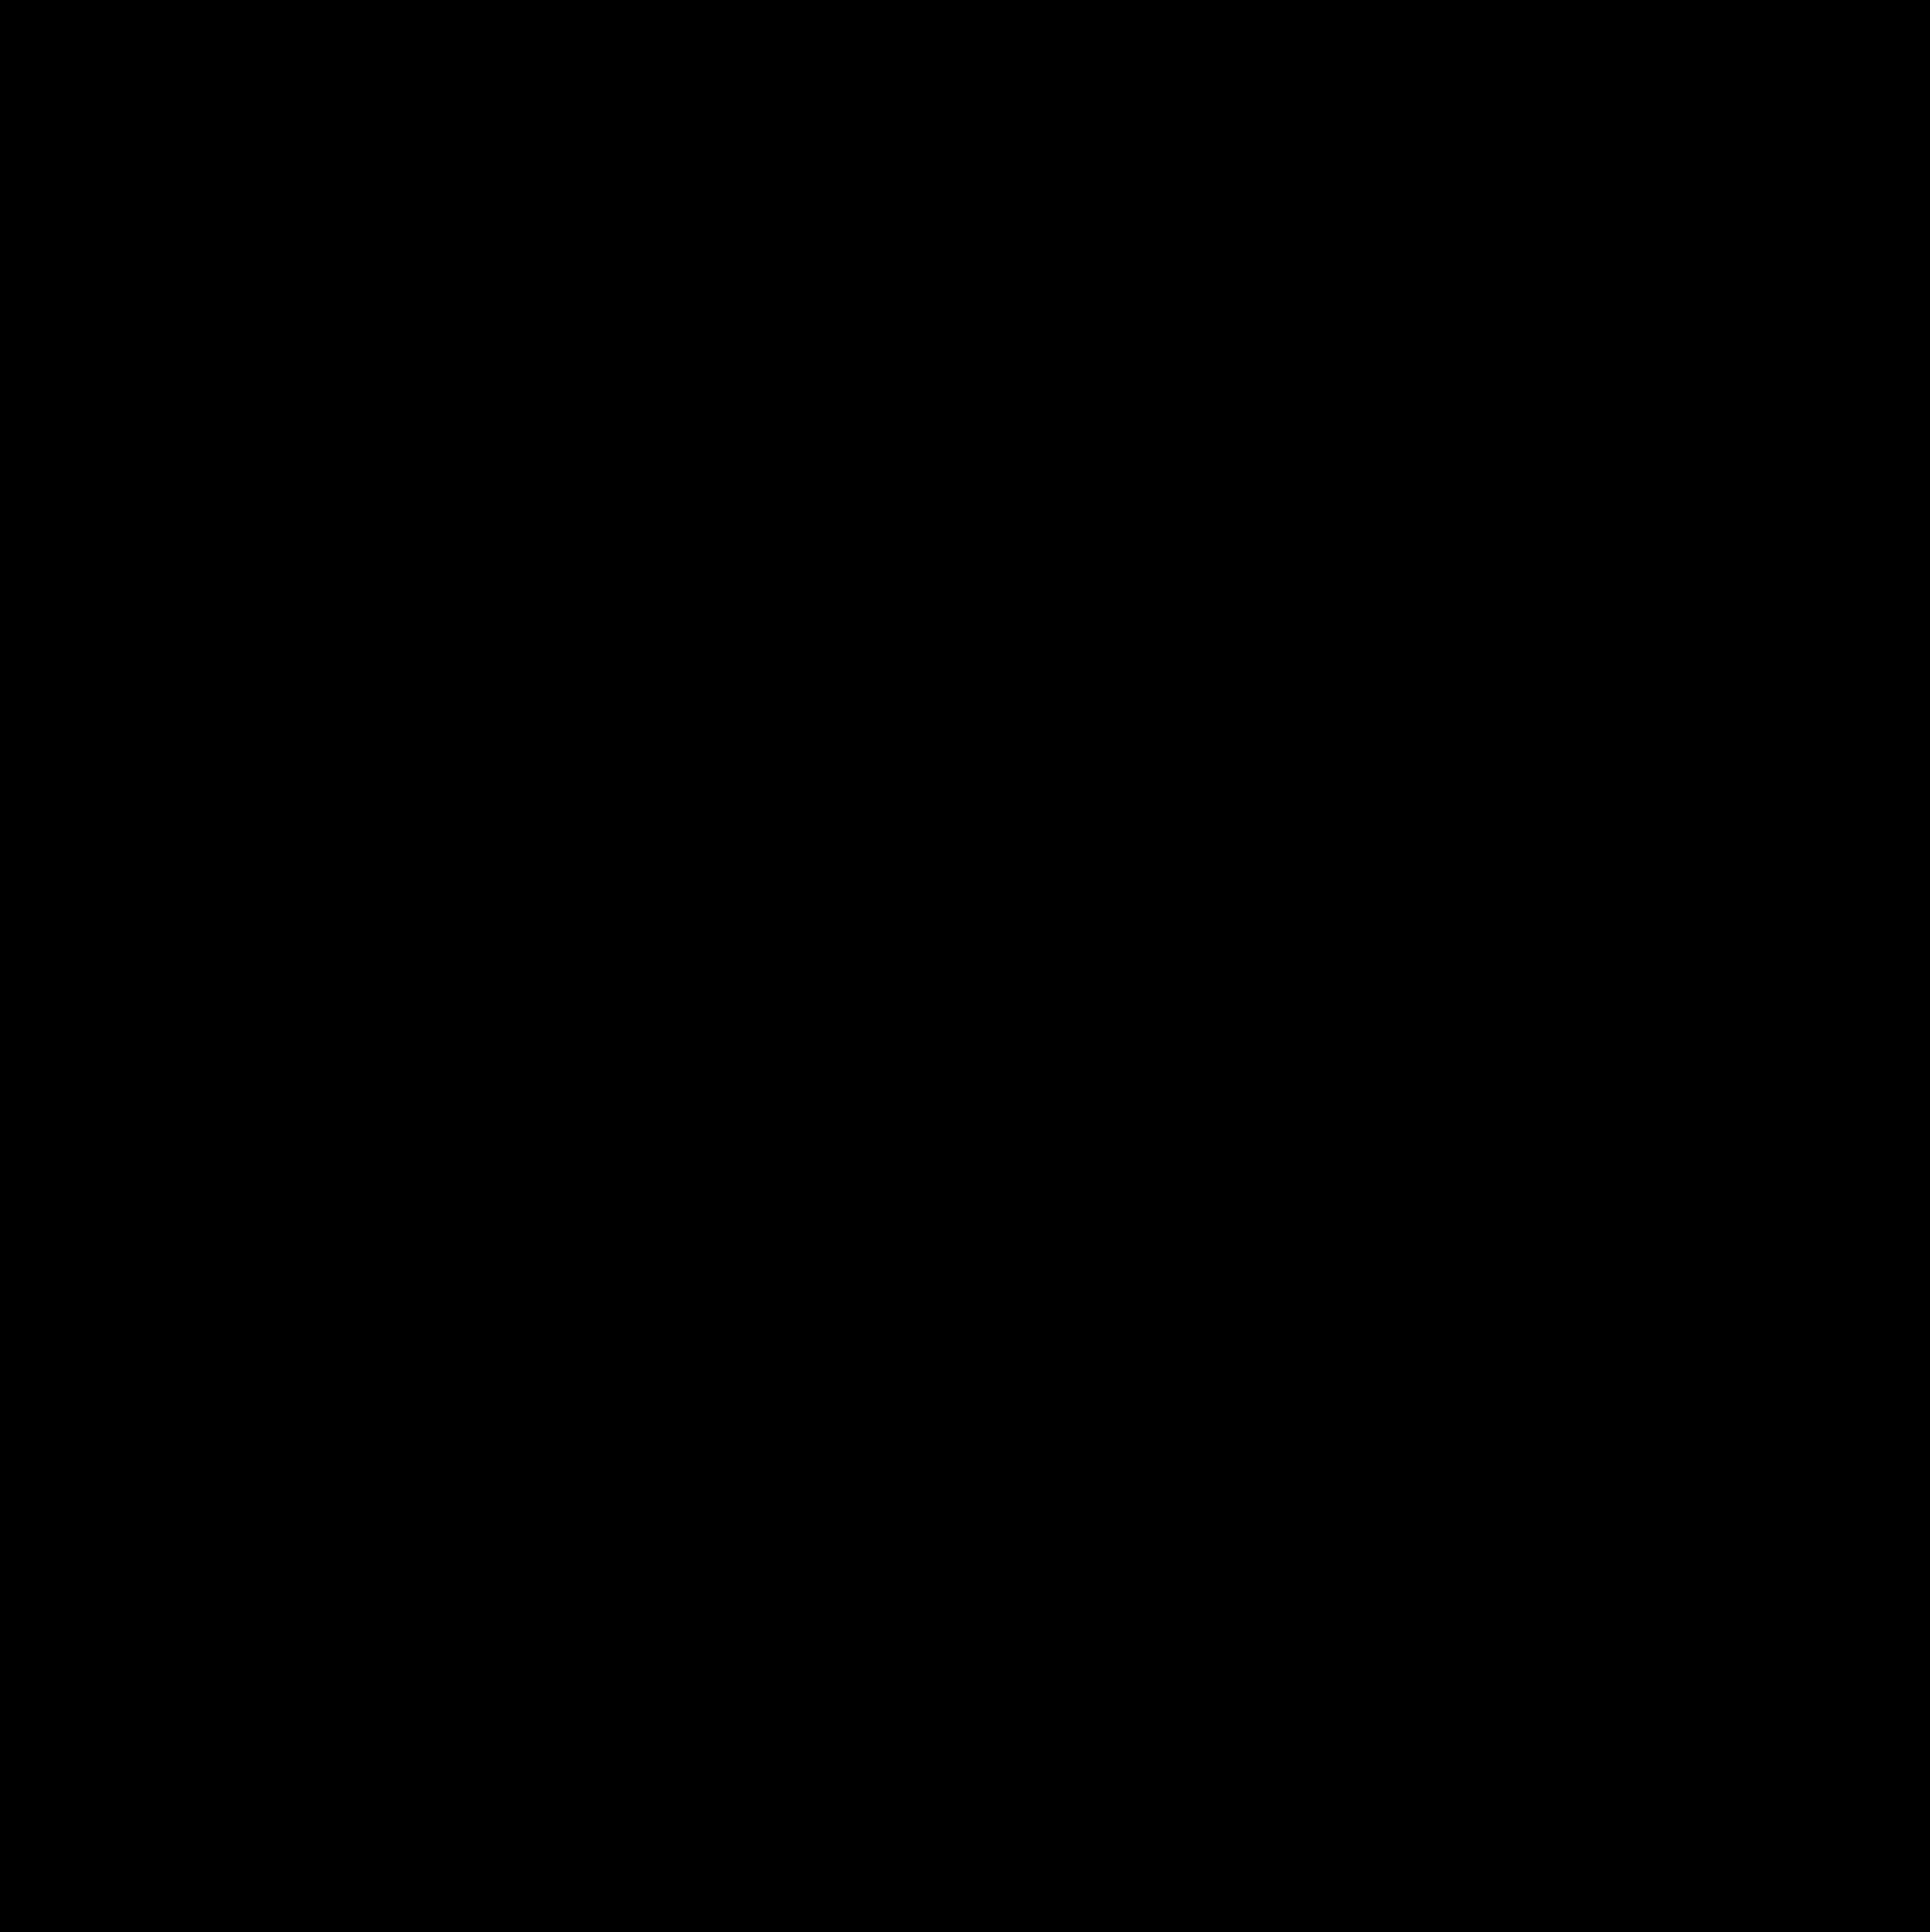 Clipart gun logo. Sight big image png